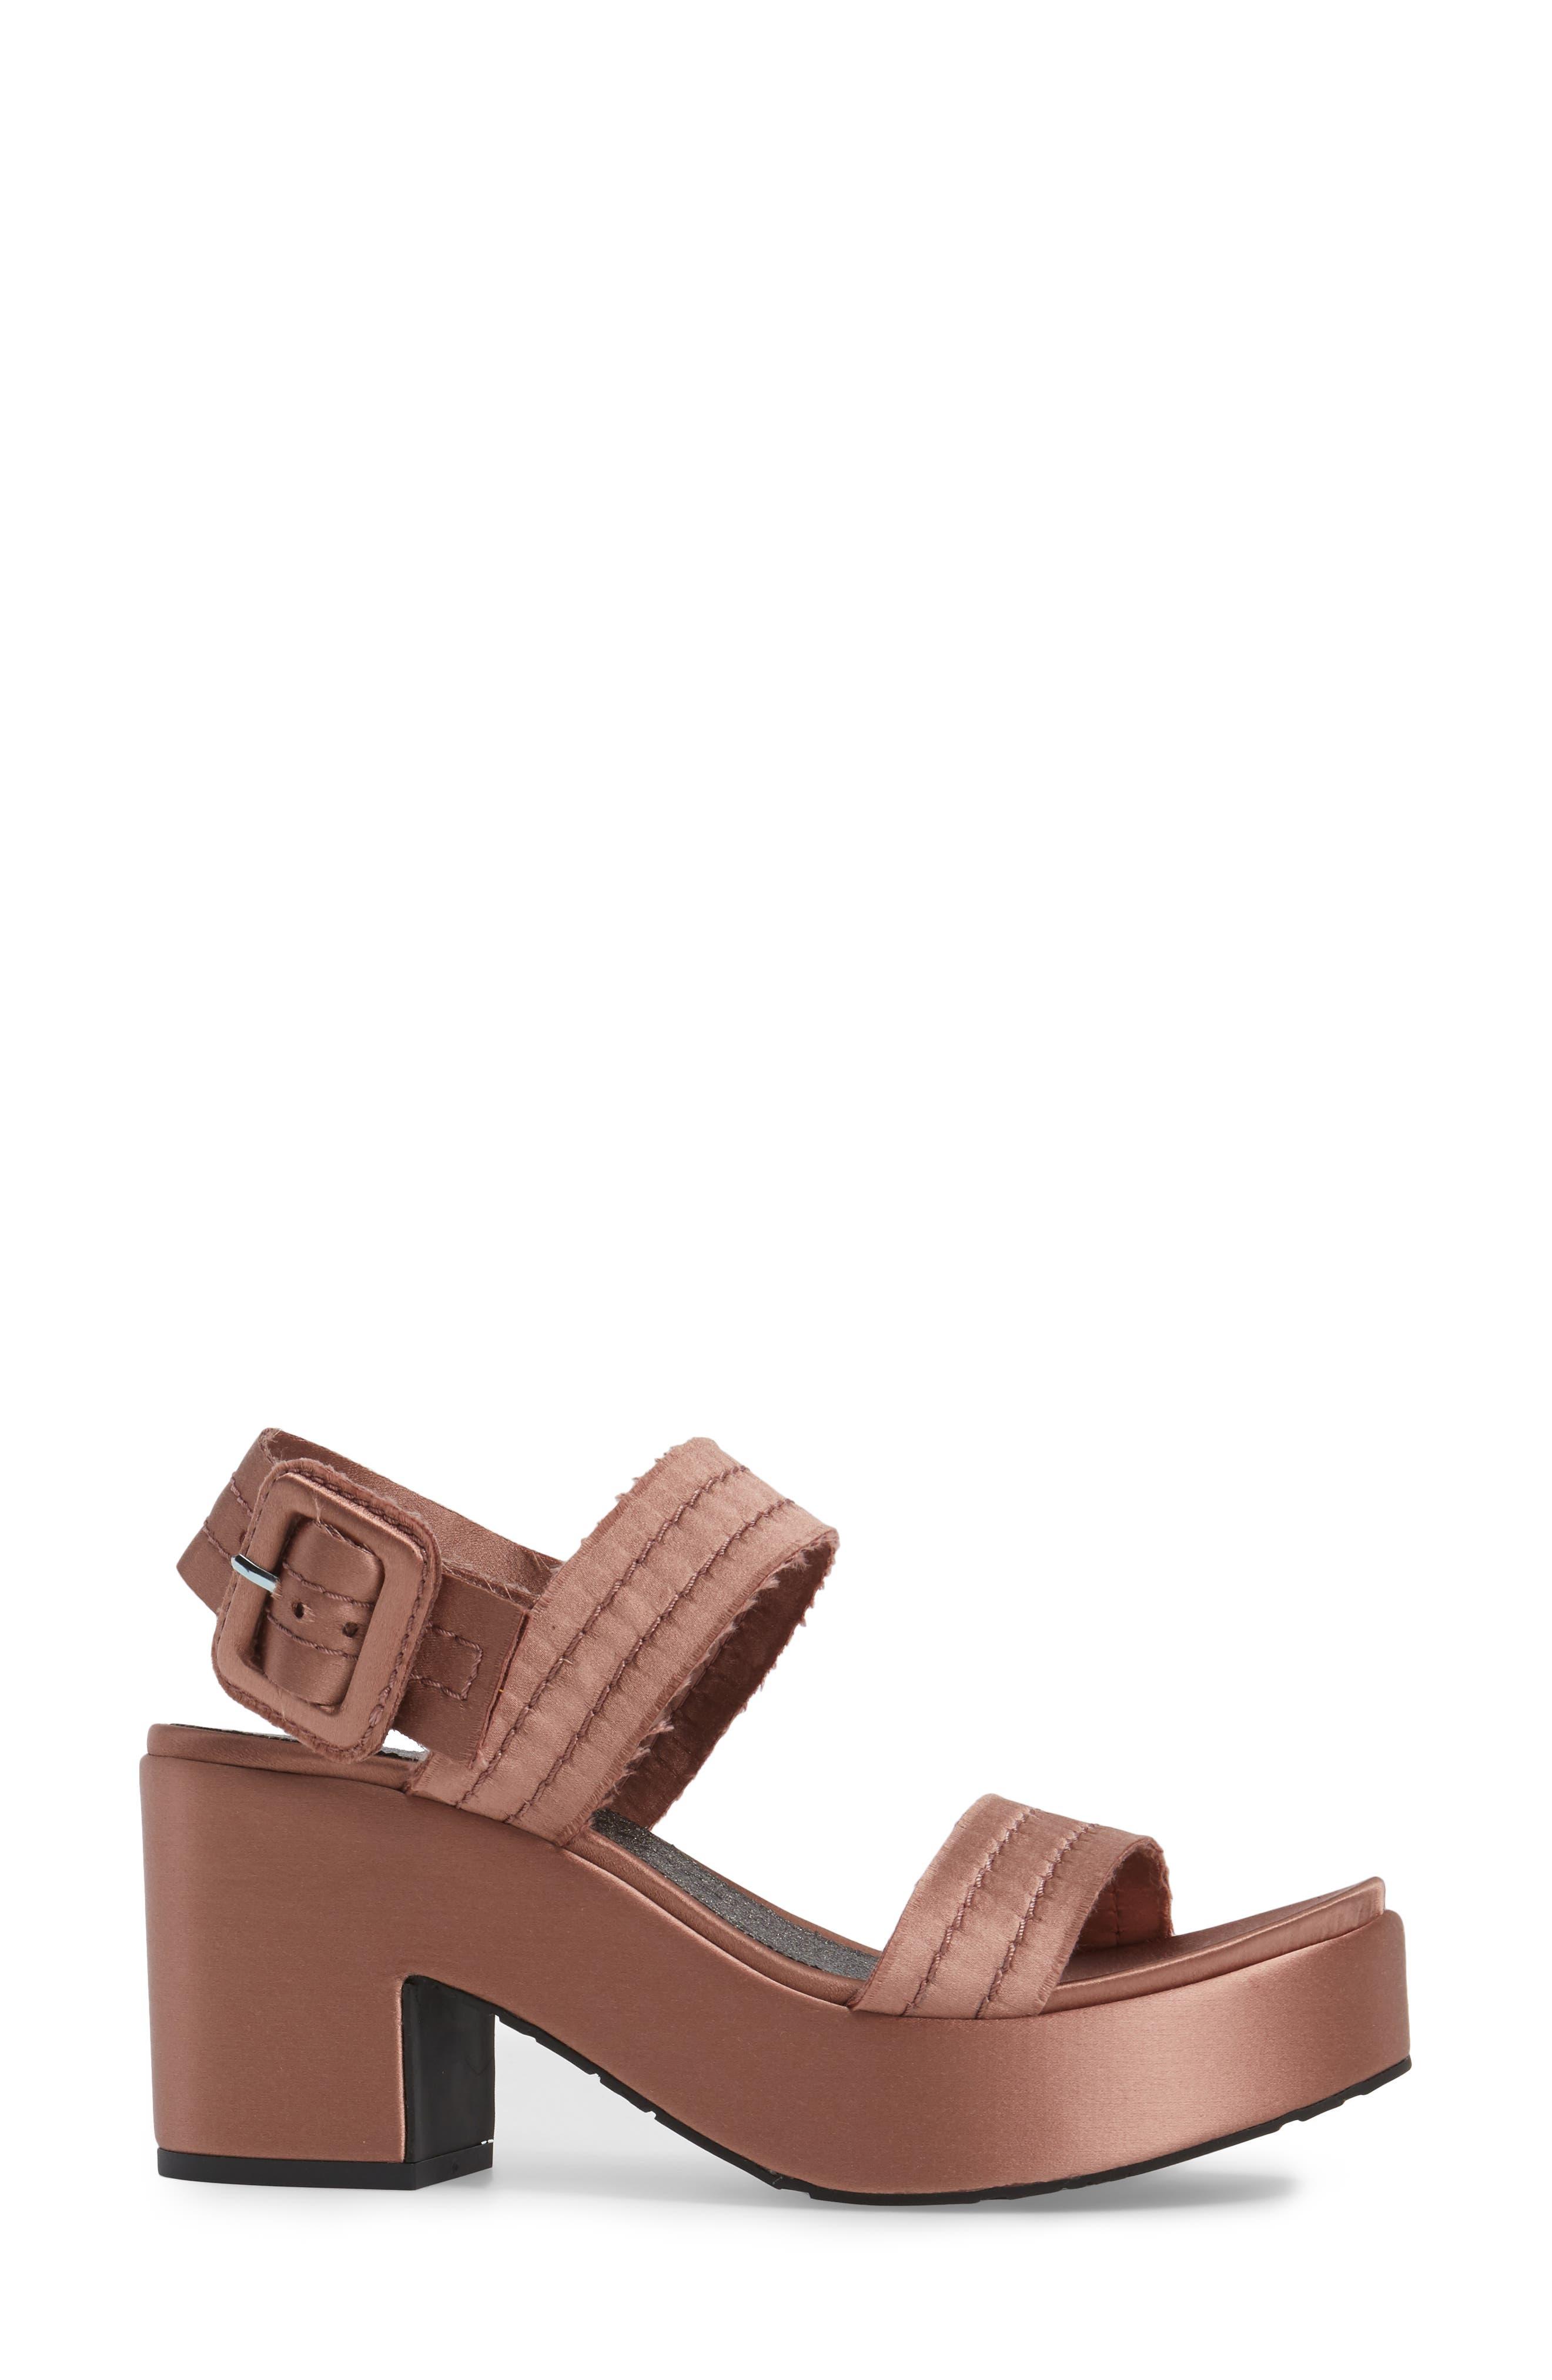 Decima Platform Sandal,                             Alternate thumbnail 3, color,                             Powder Satin